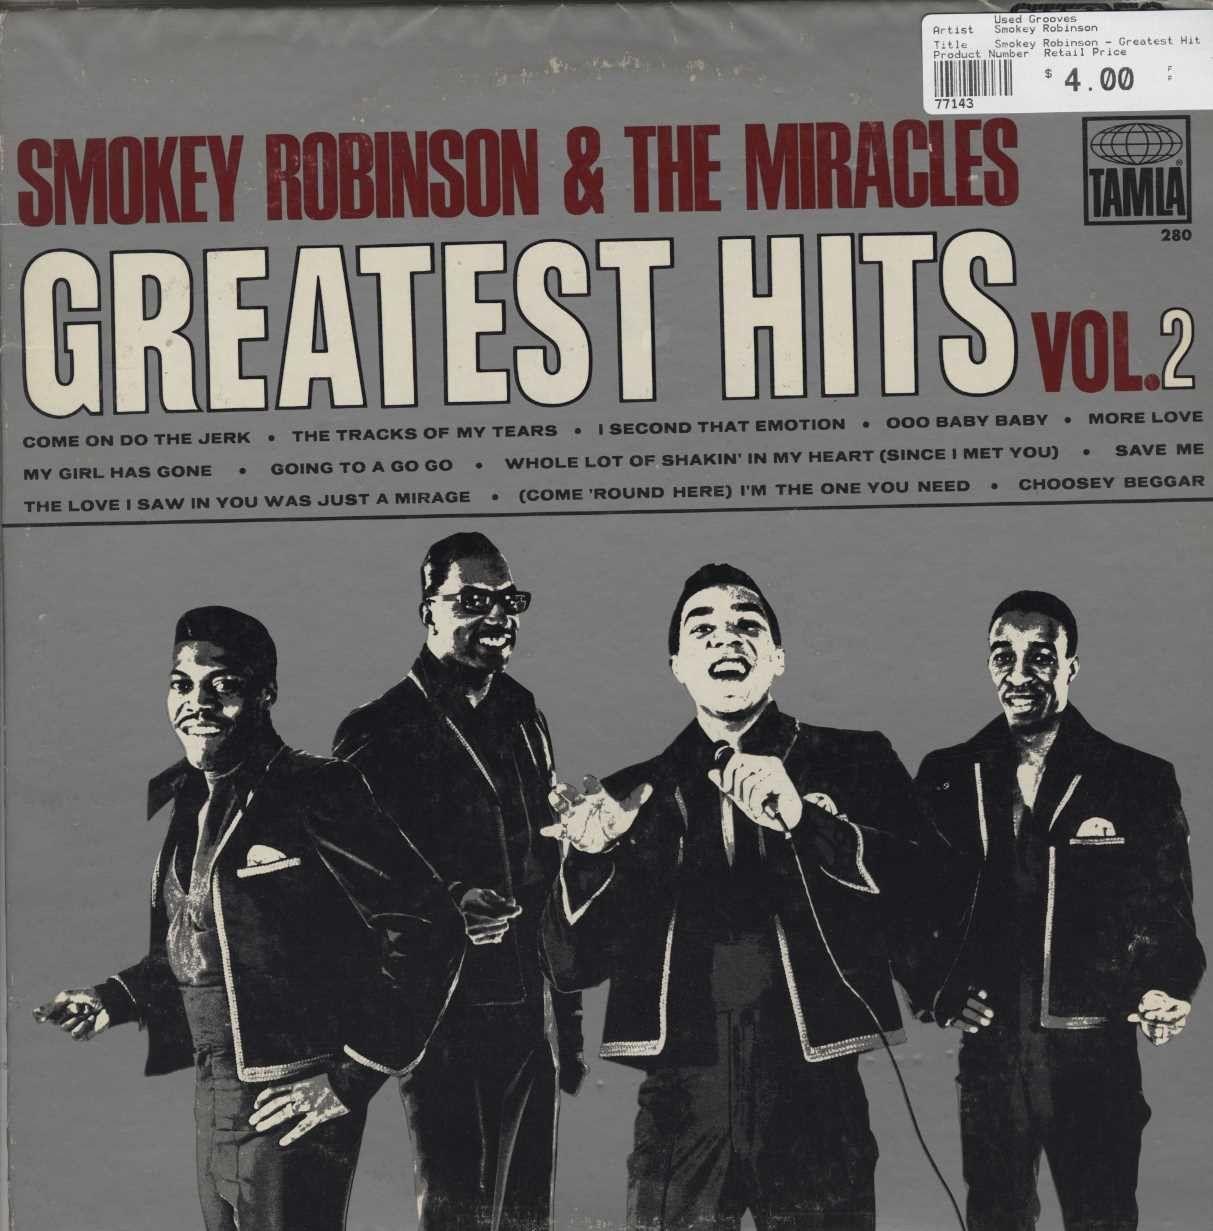 Smokey Robinson Greatest Hits Vol. 2 Smokey robinson